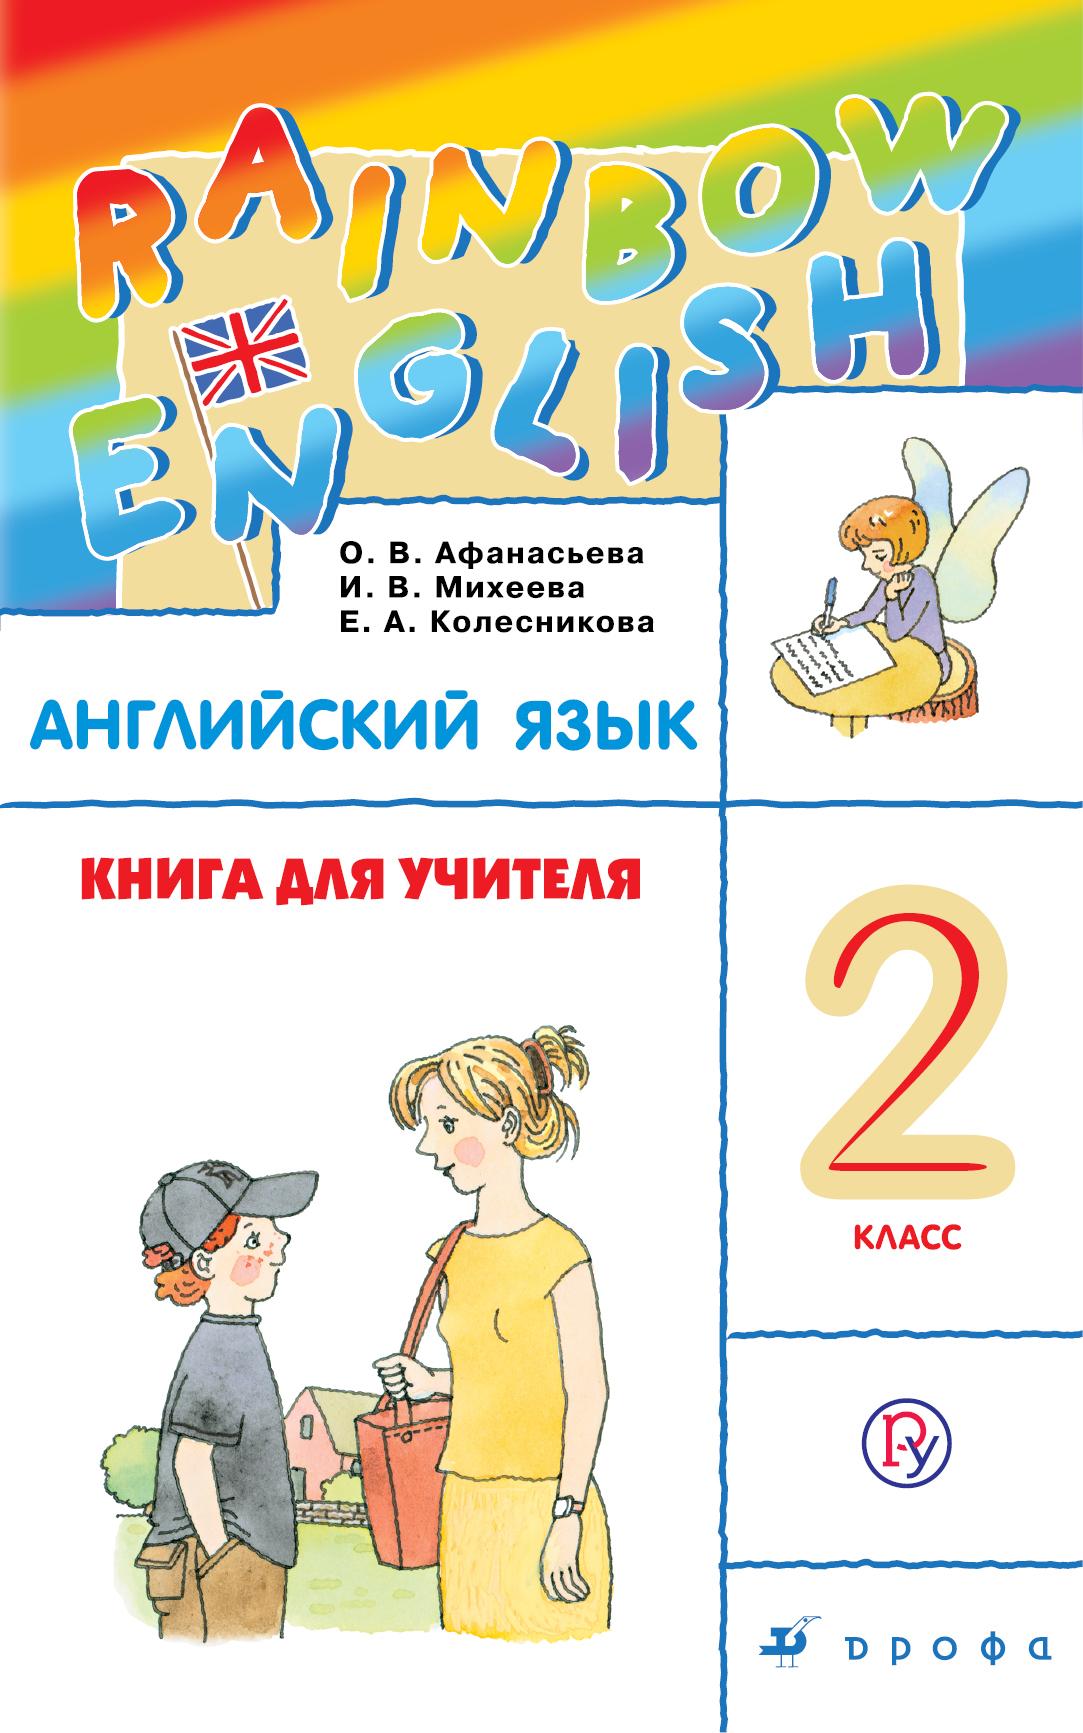 Английский язык. 2 класс. Книга для учителя ( Афанасьева О.В., Михеева И.В., Колесникова Е.А.  )